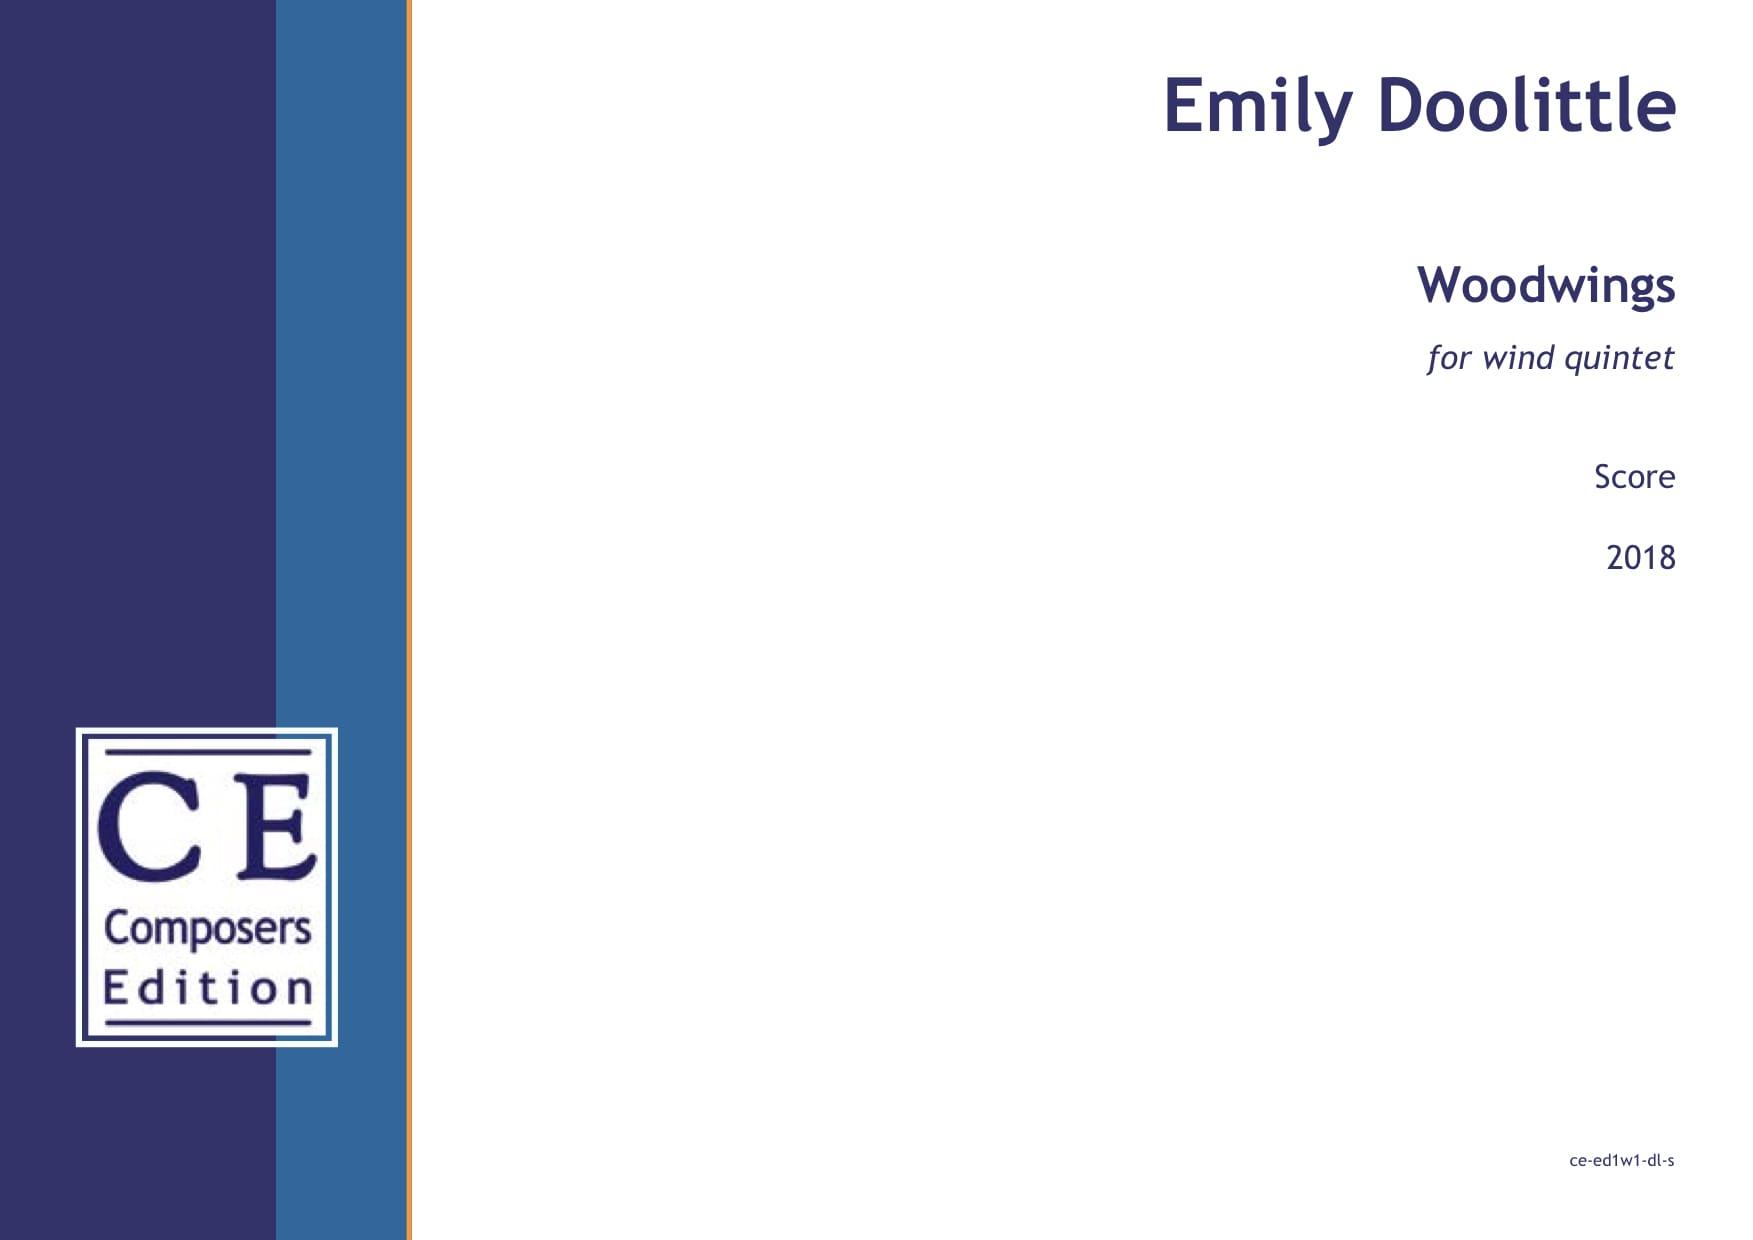 Emily Doolittle: Woodwings for wind quintet